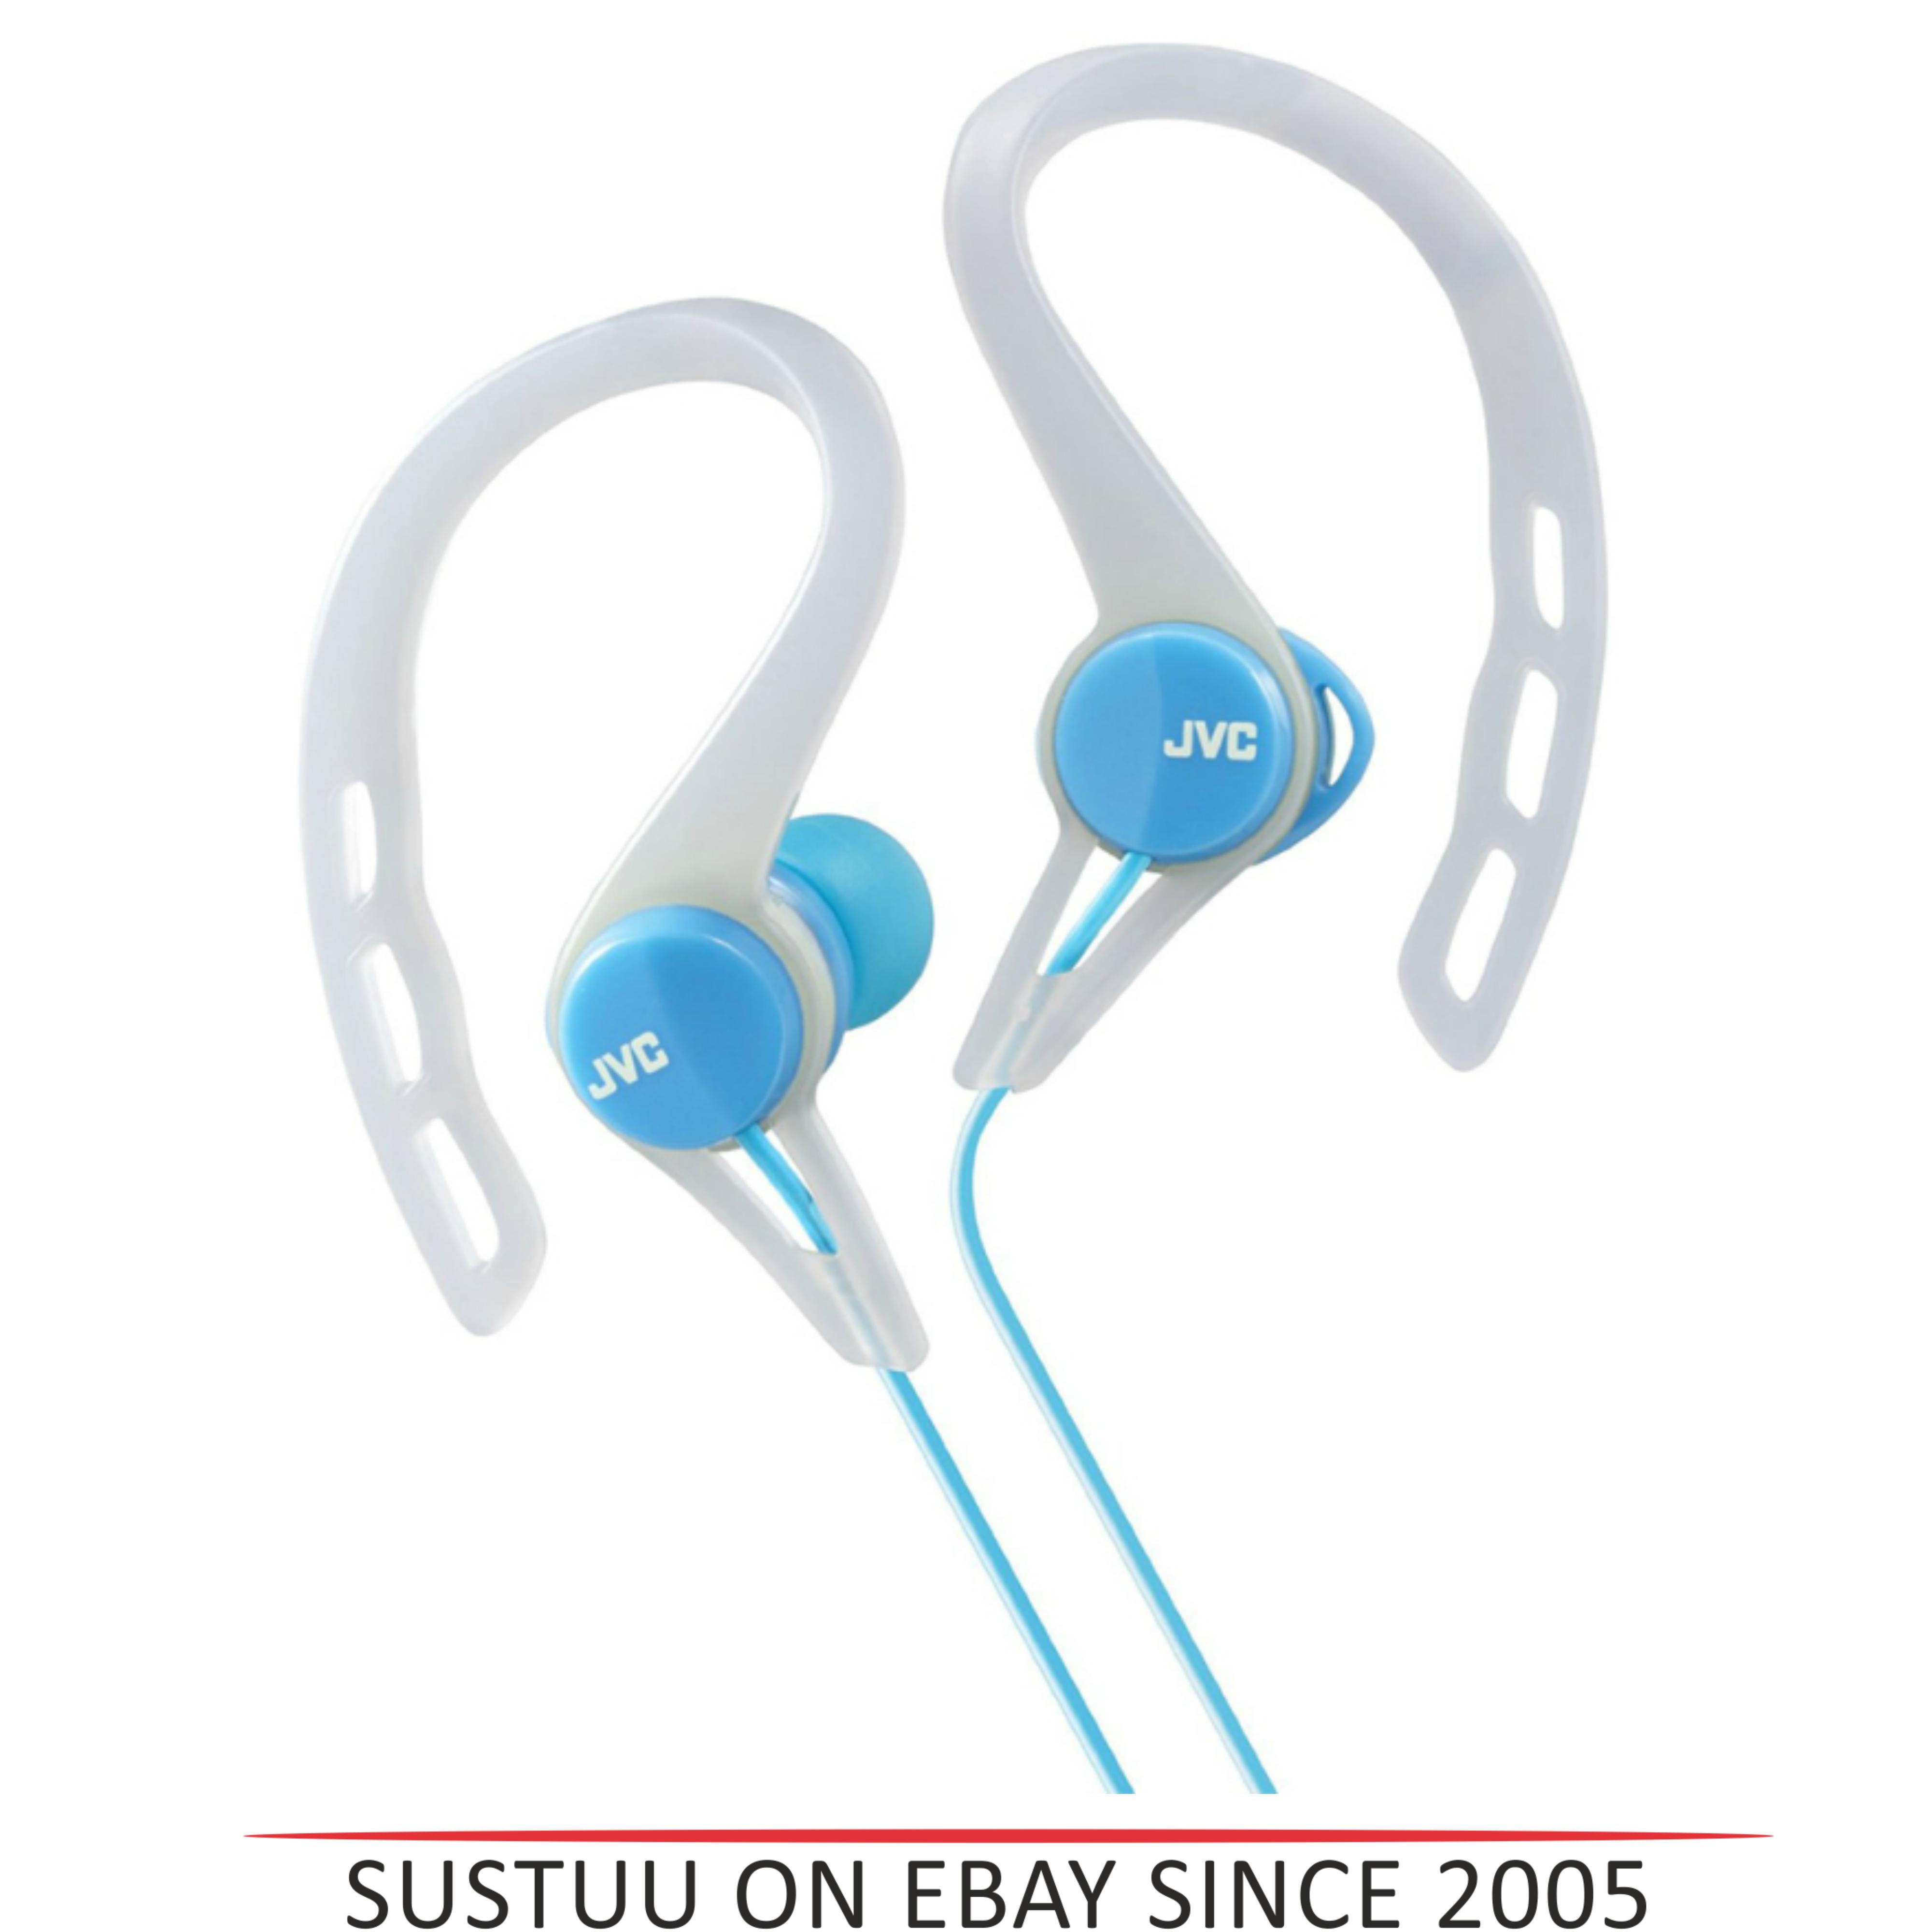 JVC HAECX20B In-Ear Pivot Motion Ear Clip Splash Proof Sports Headphones - Blue